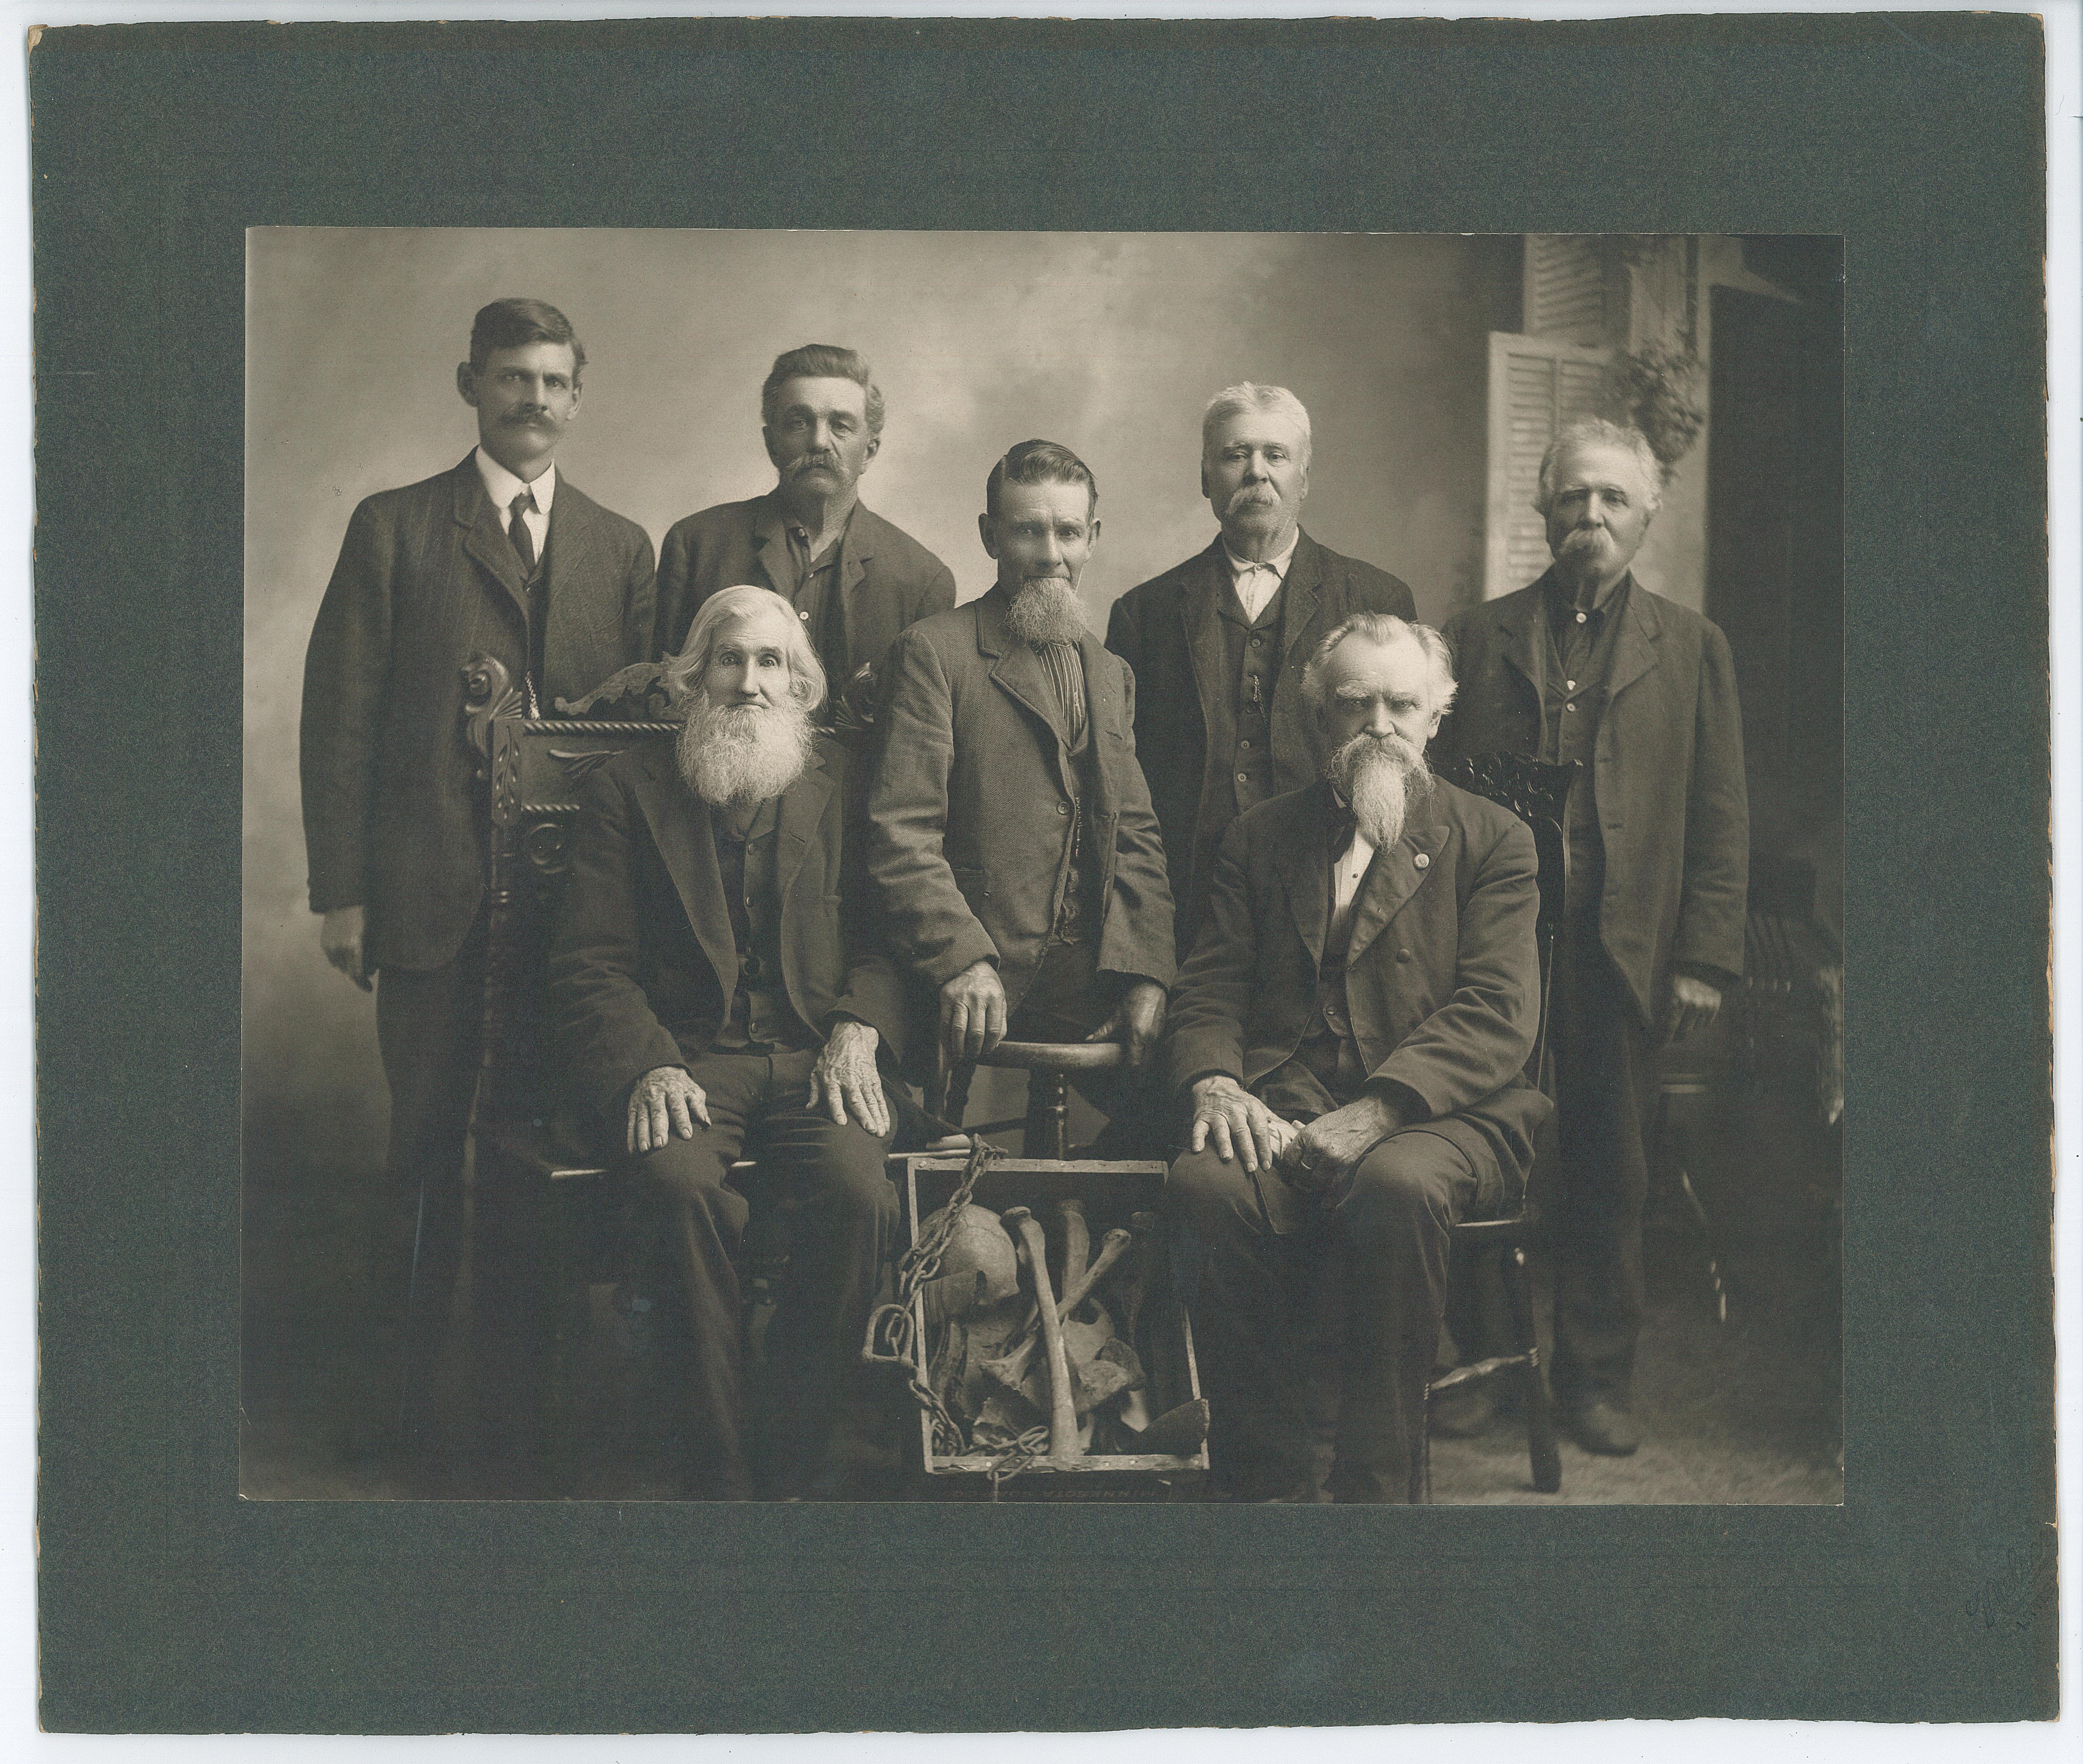 Some of the men who dug up the bones of the lynched Native Americans in June 1901. Standing from left: Charles Simmons, Frank Dufort, Sr., James Tanner, Joseph Boisjoli, Leon Boisjoli. Seated: William Nicholson (left), Nathan Richardson (right). Photo c. 1902. #1945.49.1.